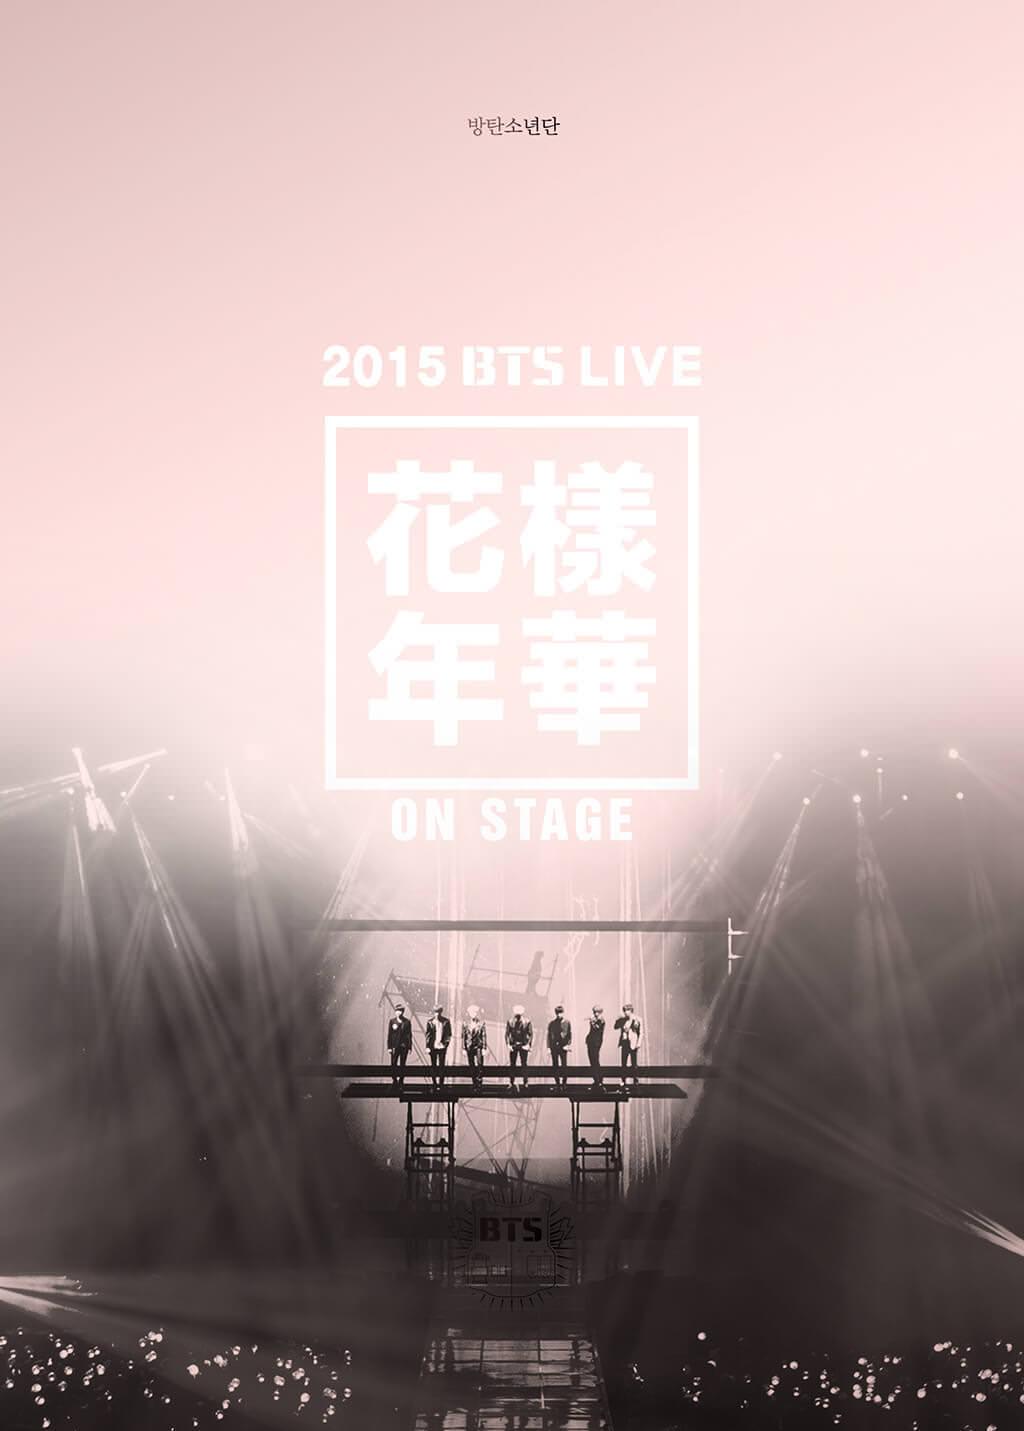 2015 BTS 花樣年華 ON STAGE